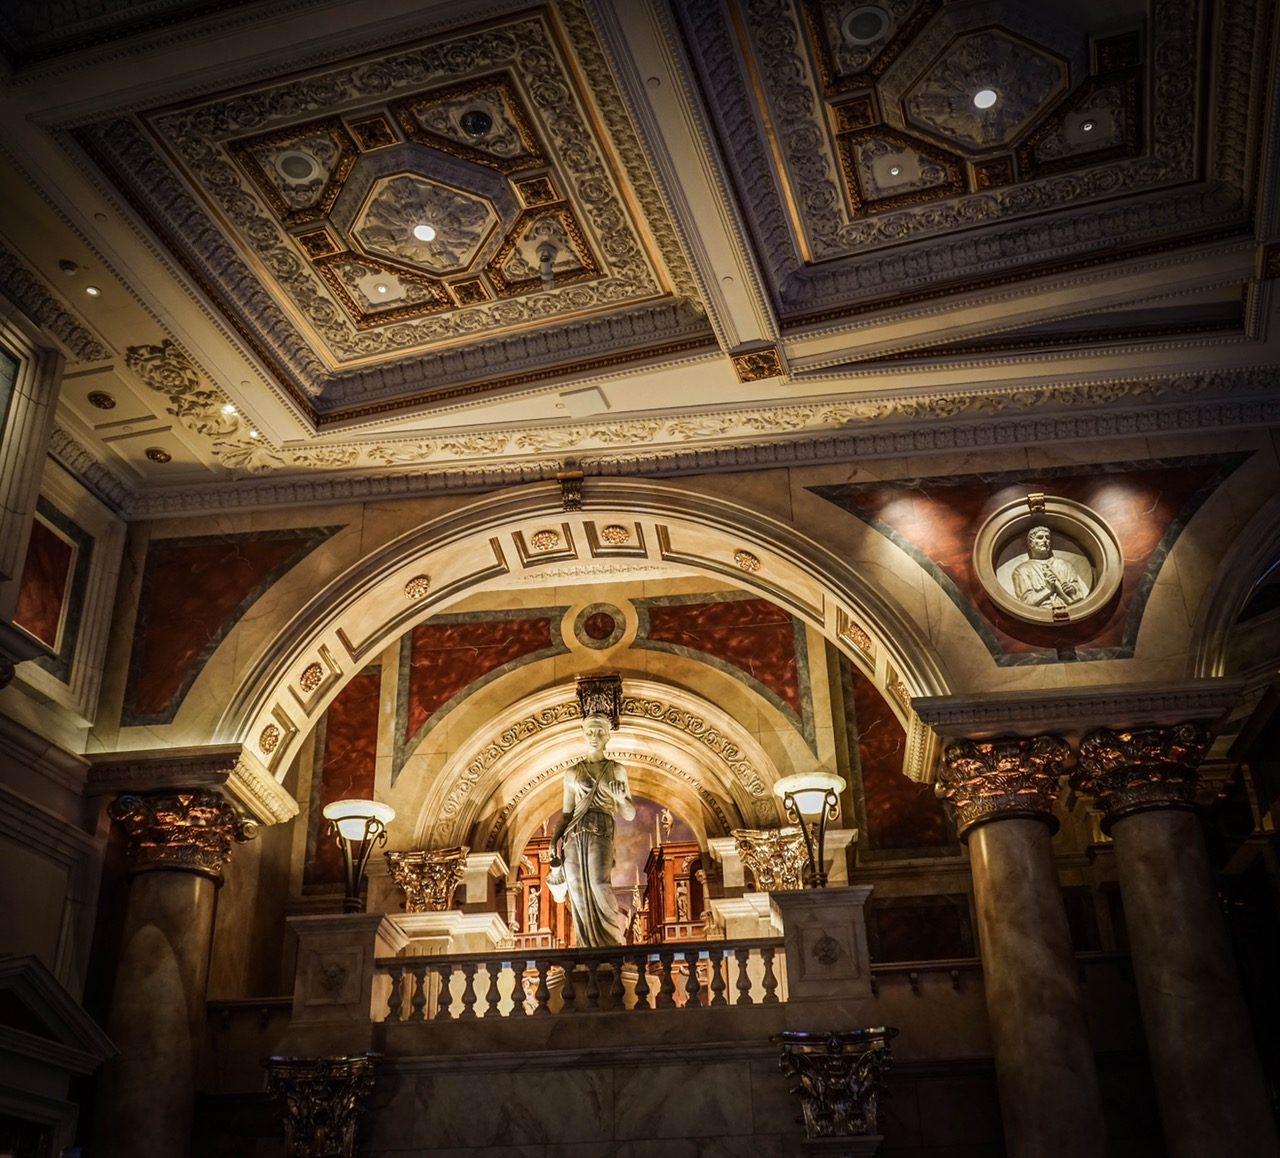 caesars-palace-las-vegas-hotel-casino-40655.jpeg